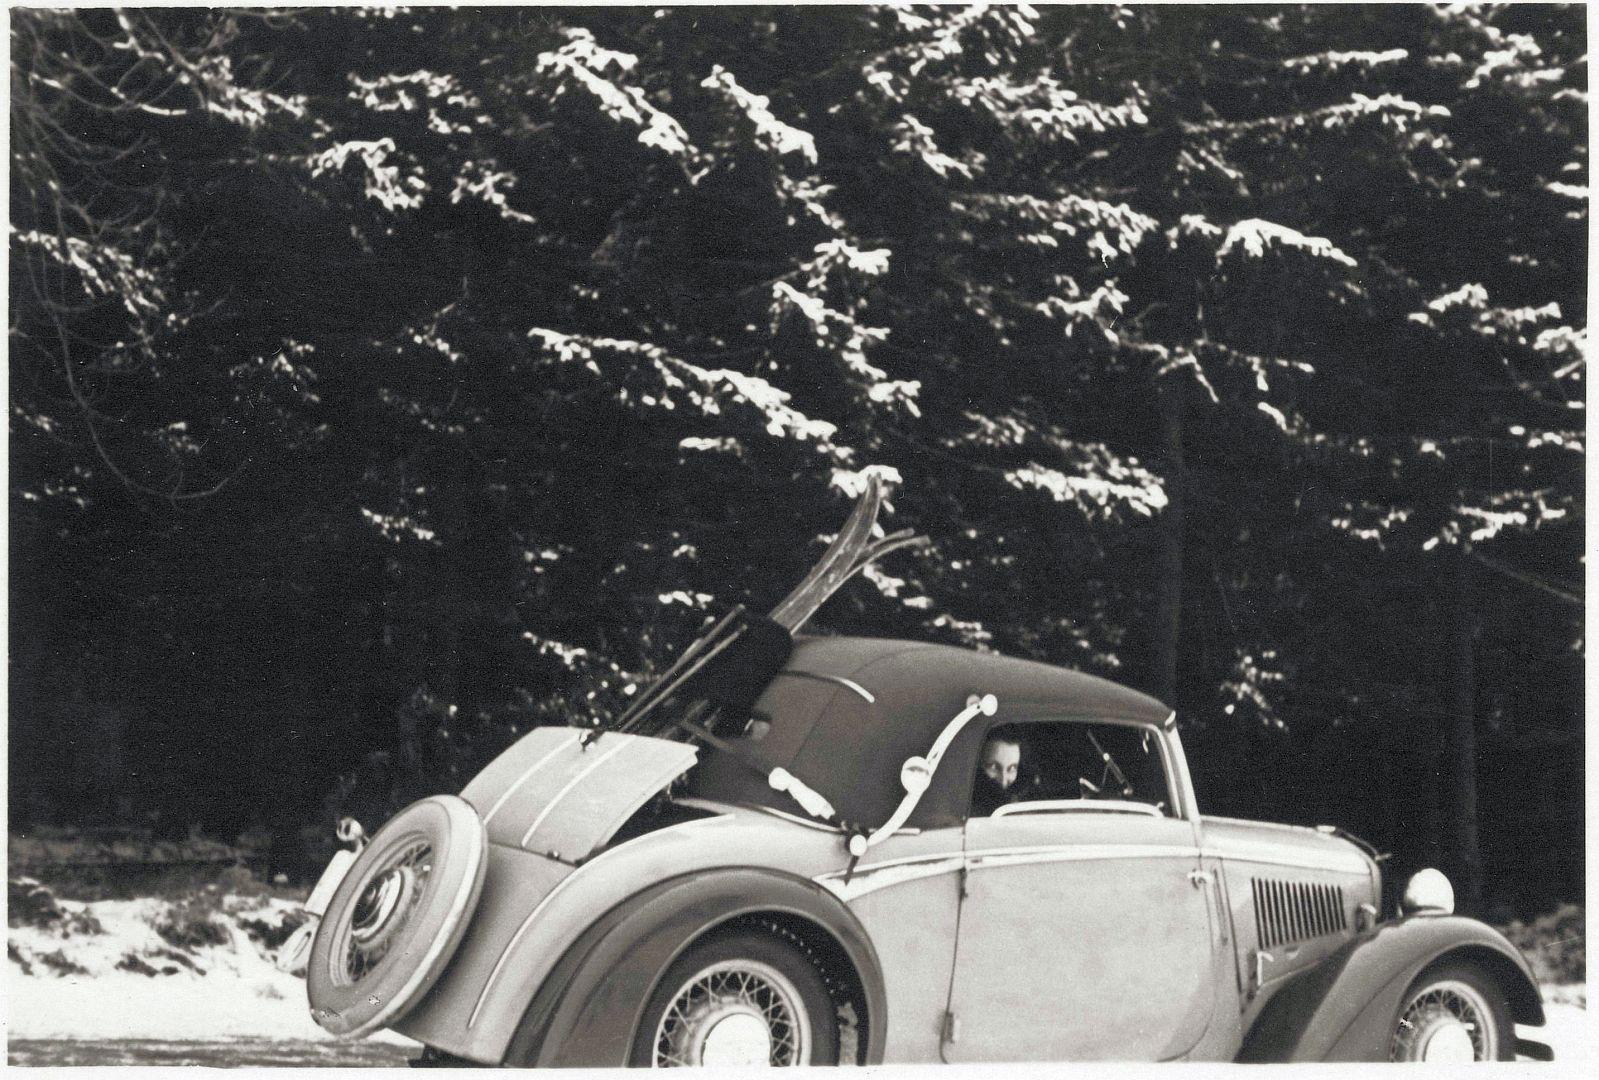 DKW_F5_Front_Luxus_Cabriolet_sitzig_Winter_Galerie.jpg